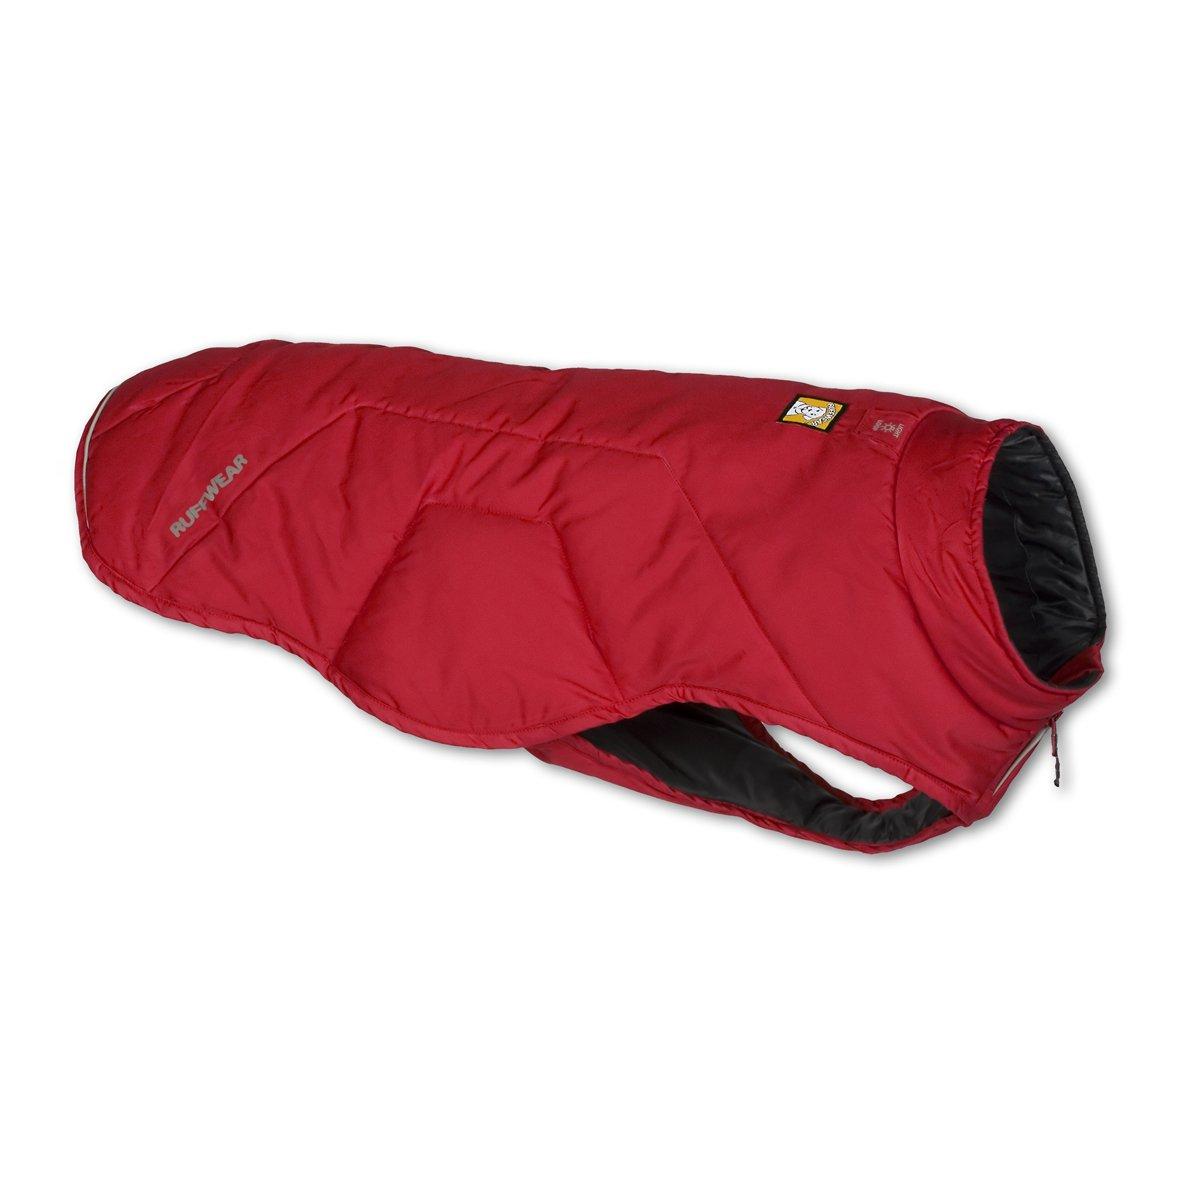 Ruffwear Quinzee Insulated Jacket, Red Rock, XX-Small